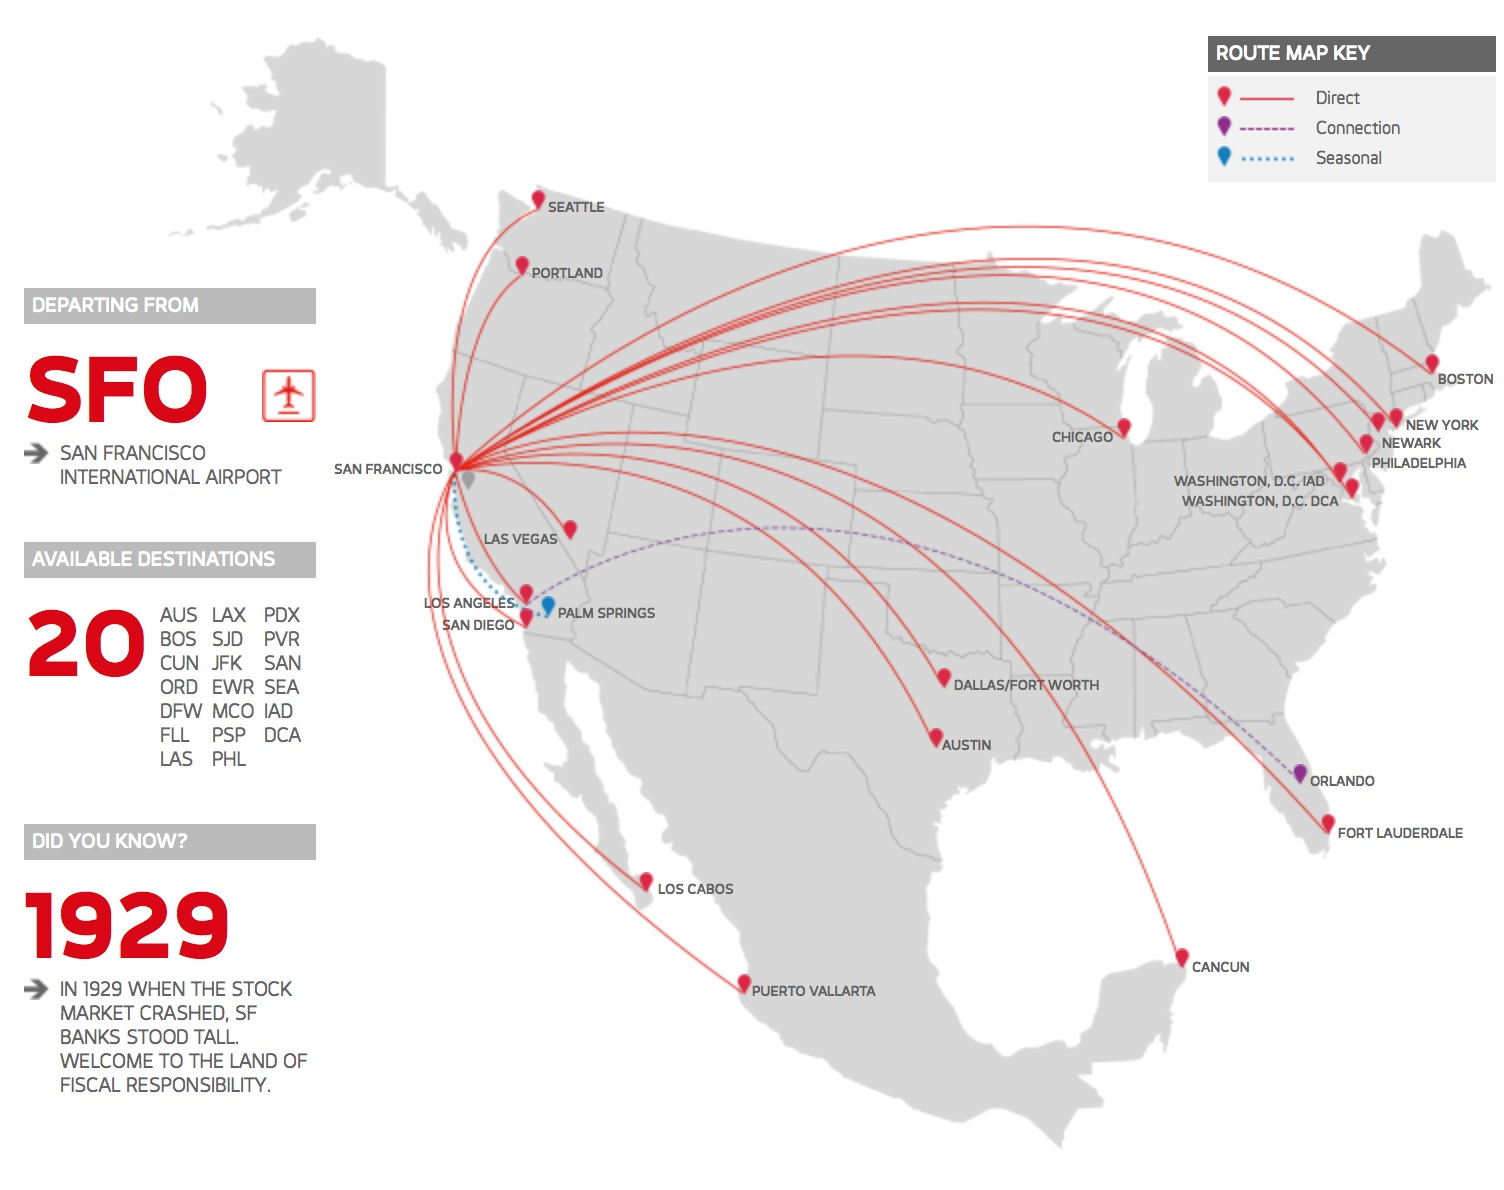 virgin america routes